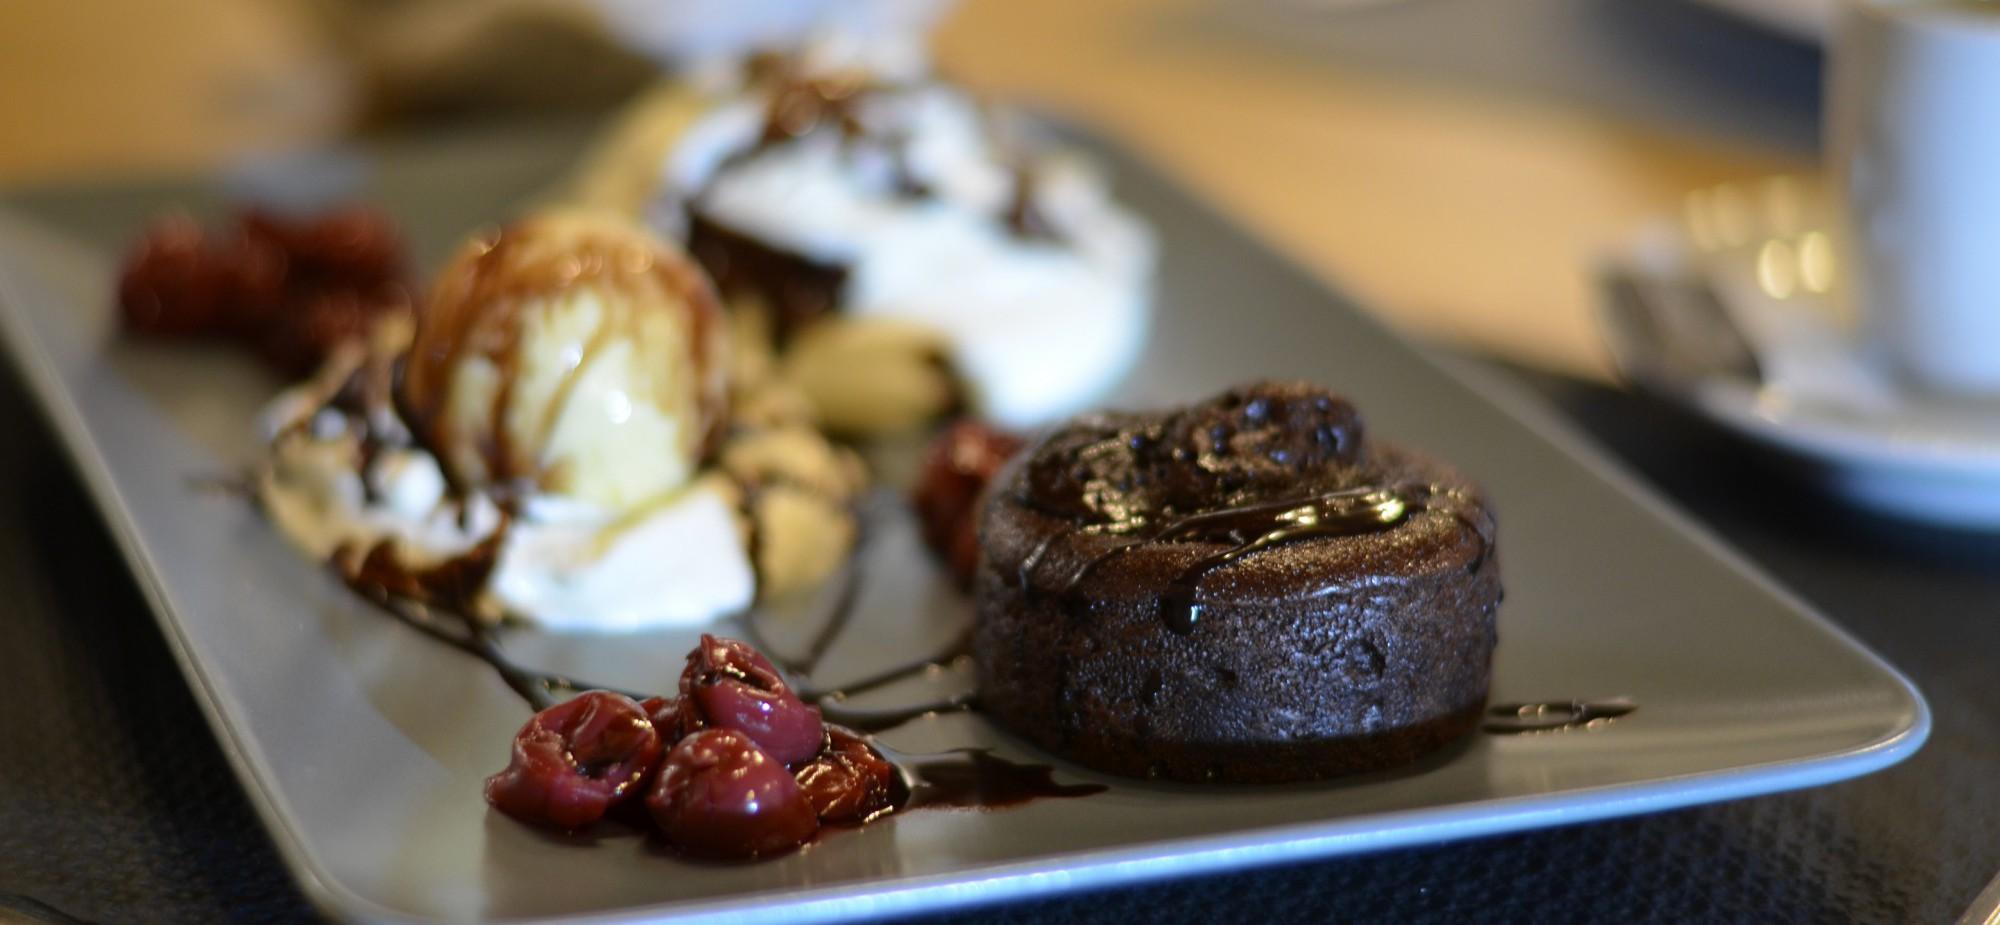 Restaurant-Schmuggelbud-Überherrn-Kuchen-Schokolade-Fondant